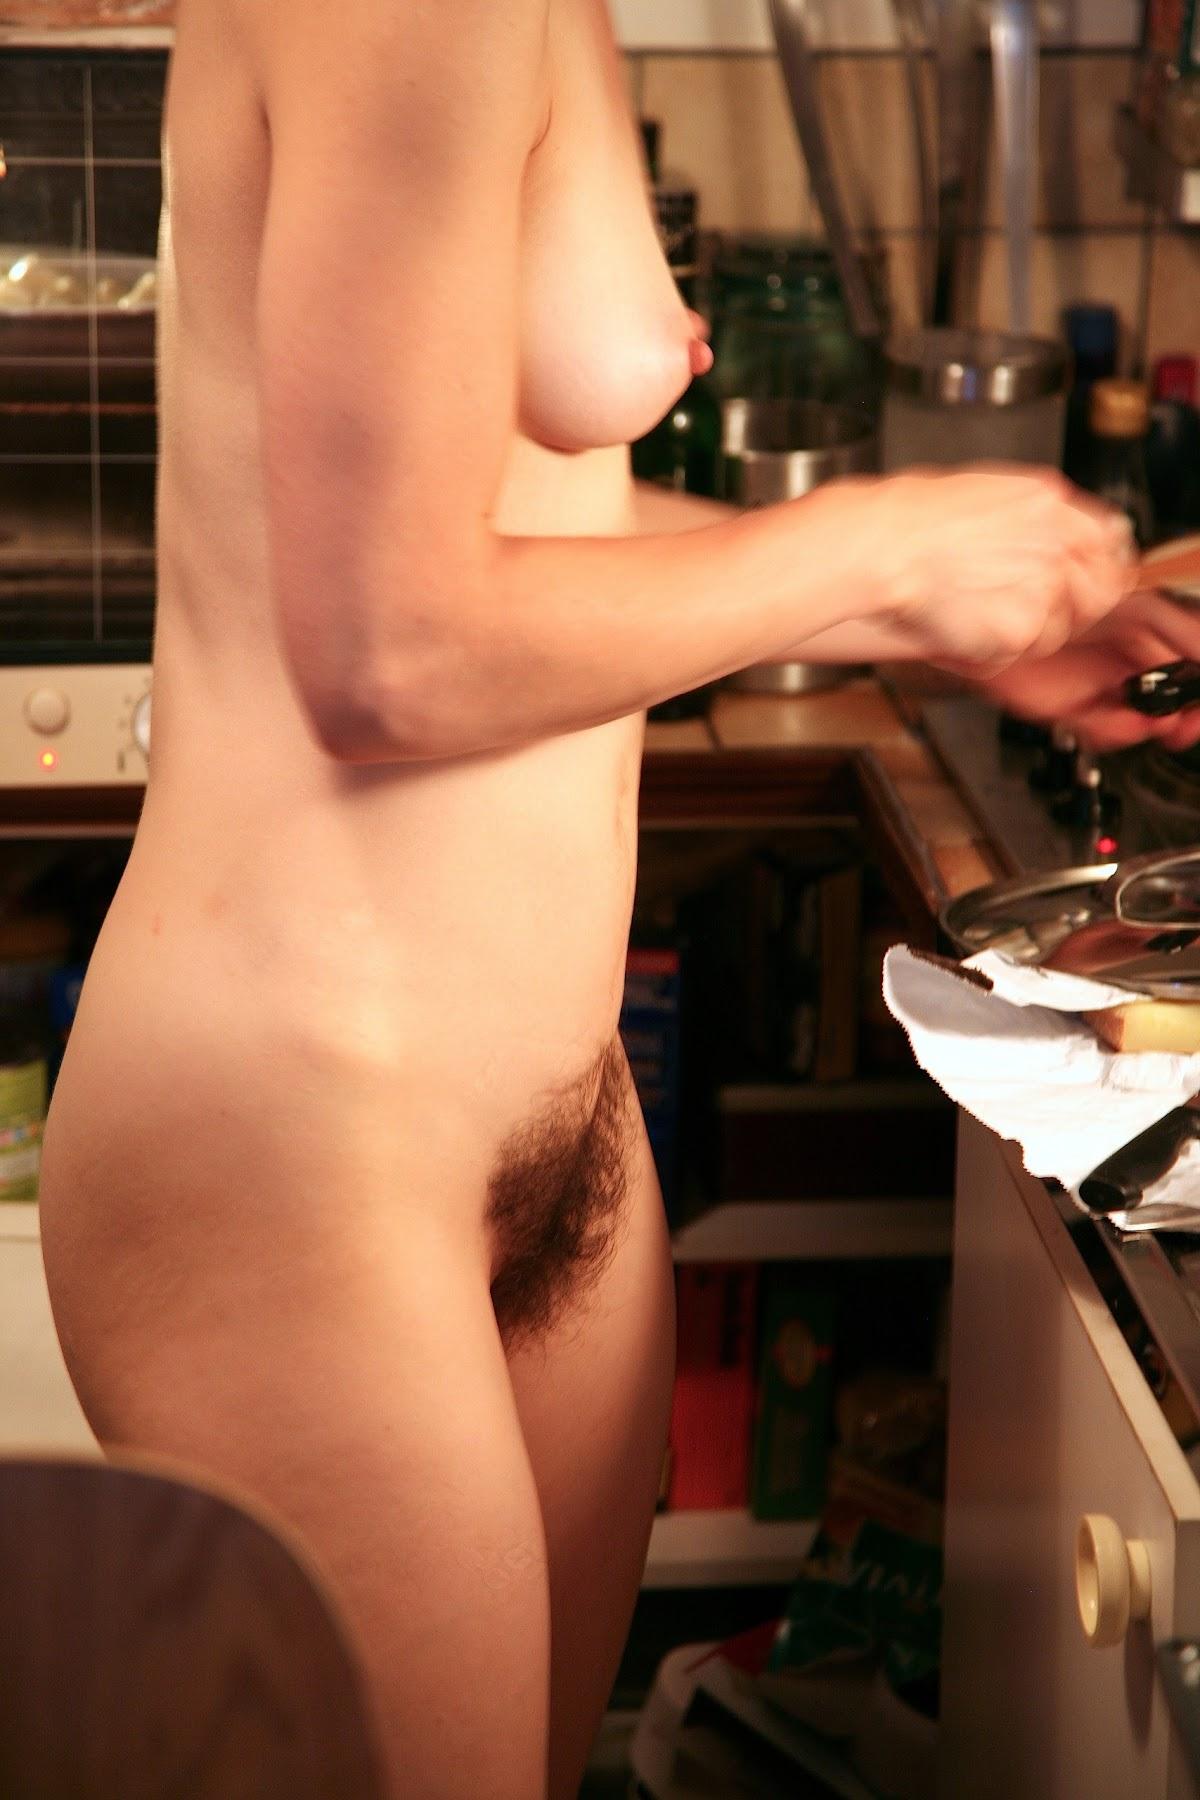 http://1.bp.blogspot.com/-q8bGyj5QgiE/Tp8d7UwXlkI/AAAAAAAADm8/CY6wHzTaEfU/s1800/kitchen+cook.jpg